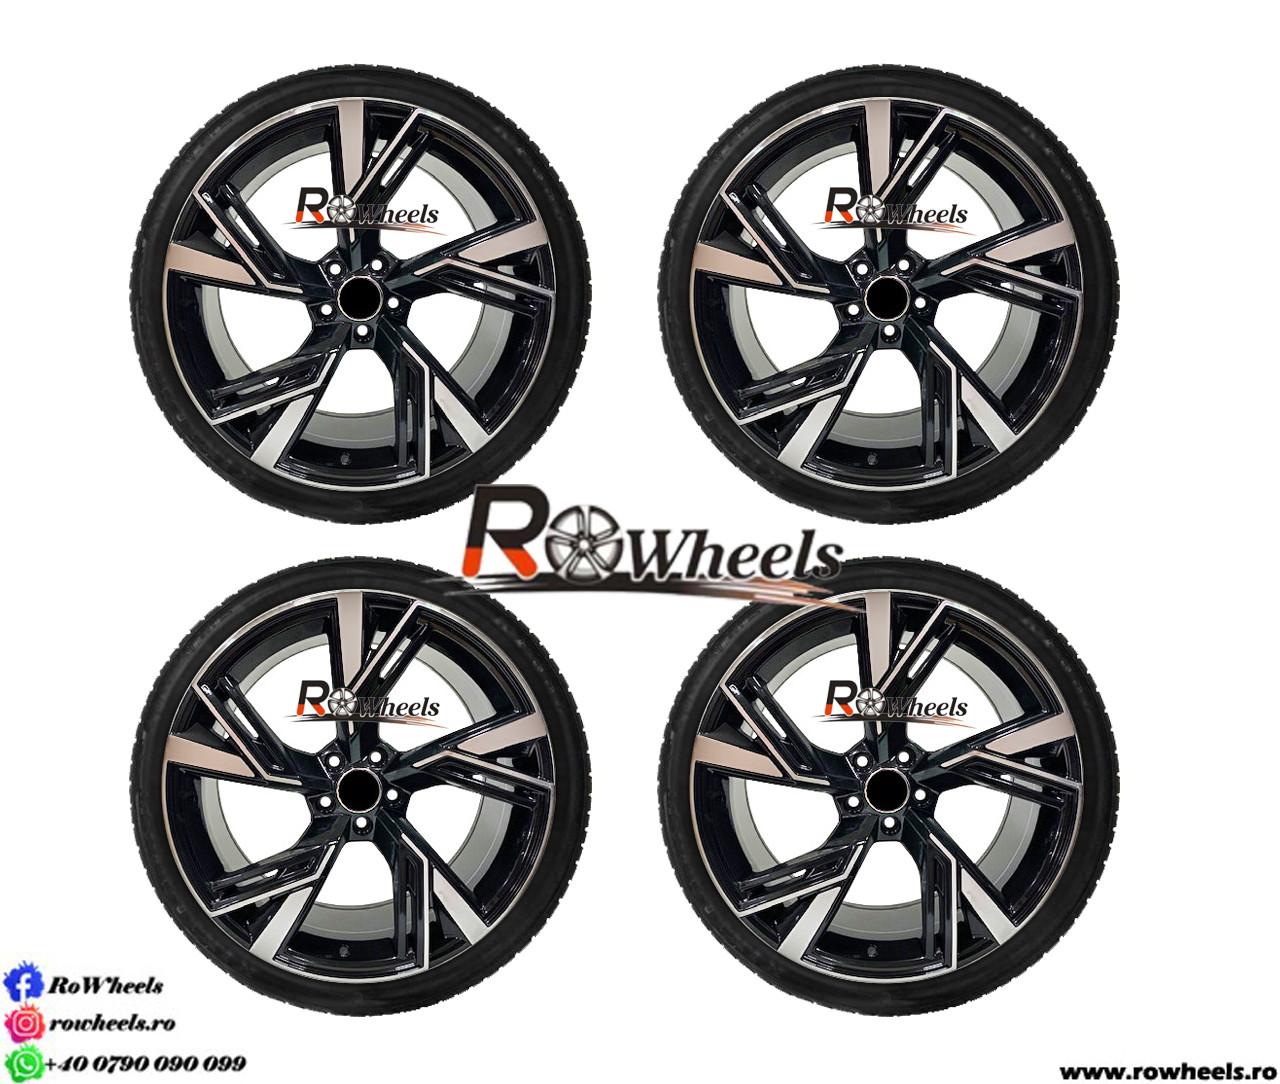 Jante AUDI RS21 R21 Black Model 2021 RS A5 A6 A7 A8 Q3 Q5 Q7 Q8 RS